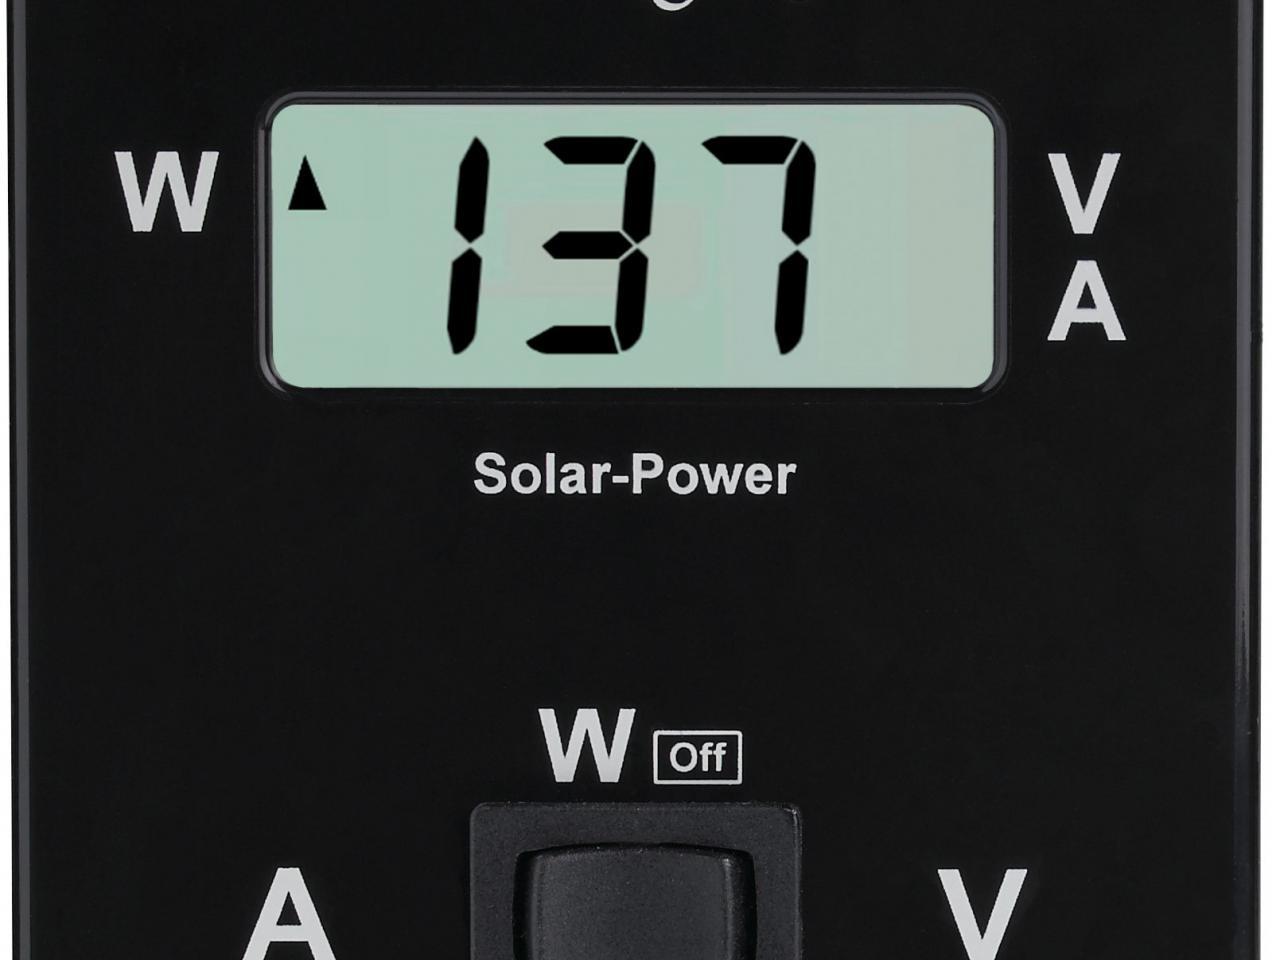 Votronic solar